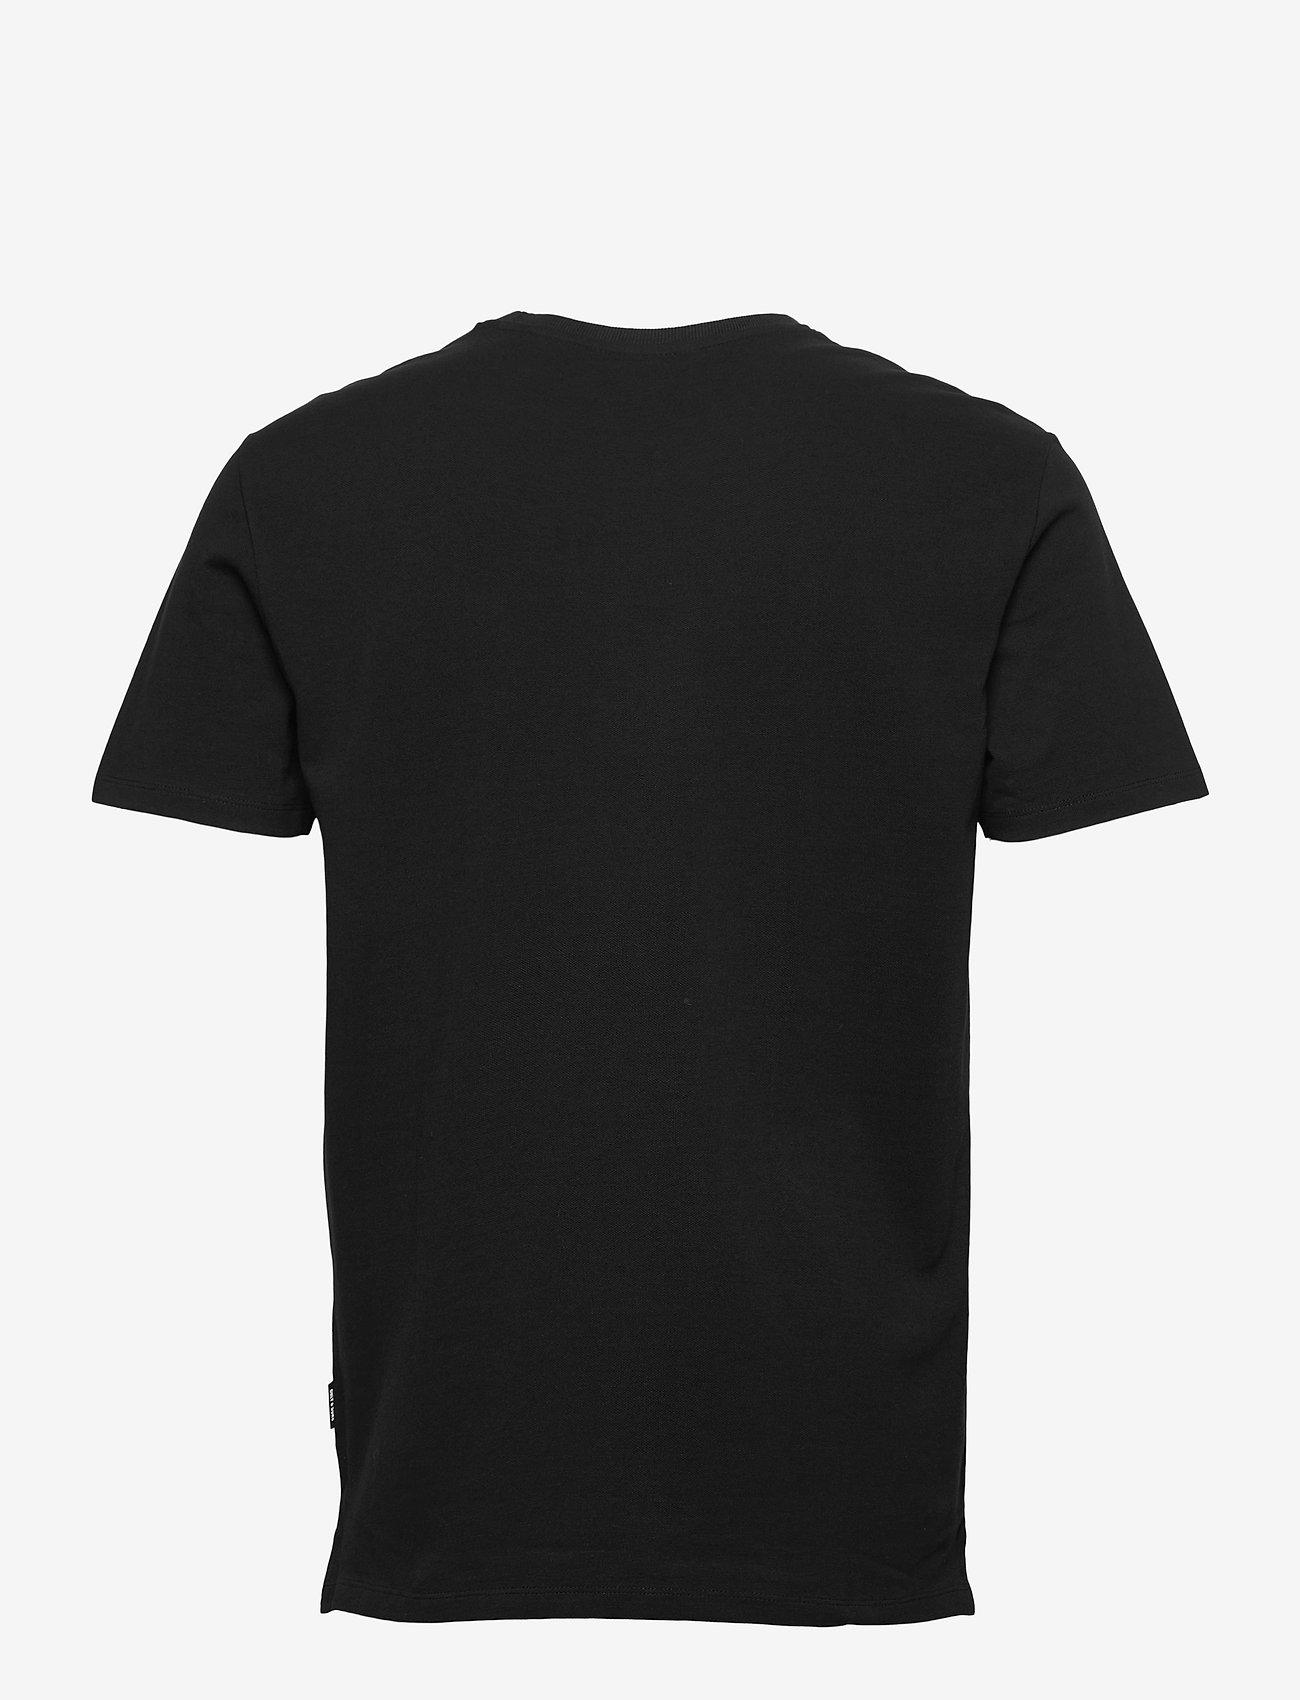 ONLY & SONS - ONSABRAM LIFE REG SS TEE - podstawowe koszulki - black - 1